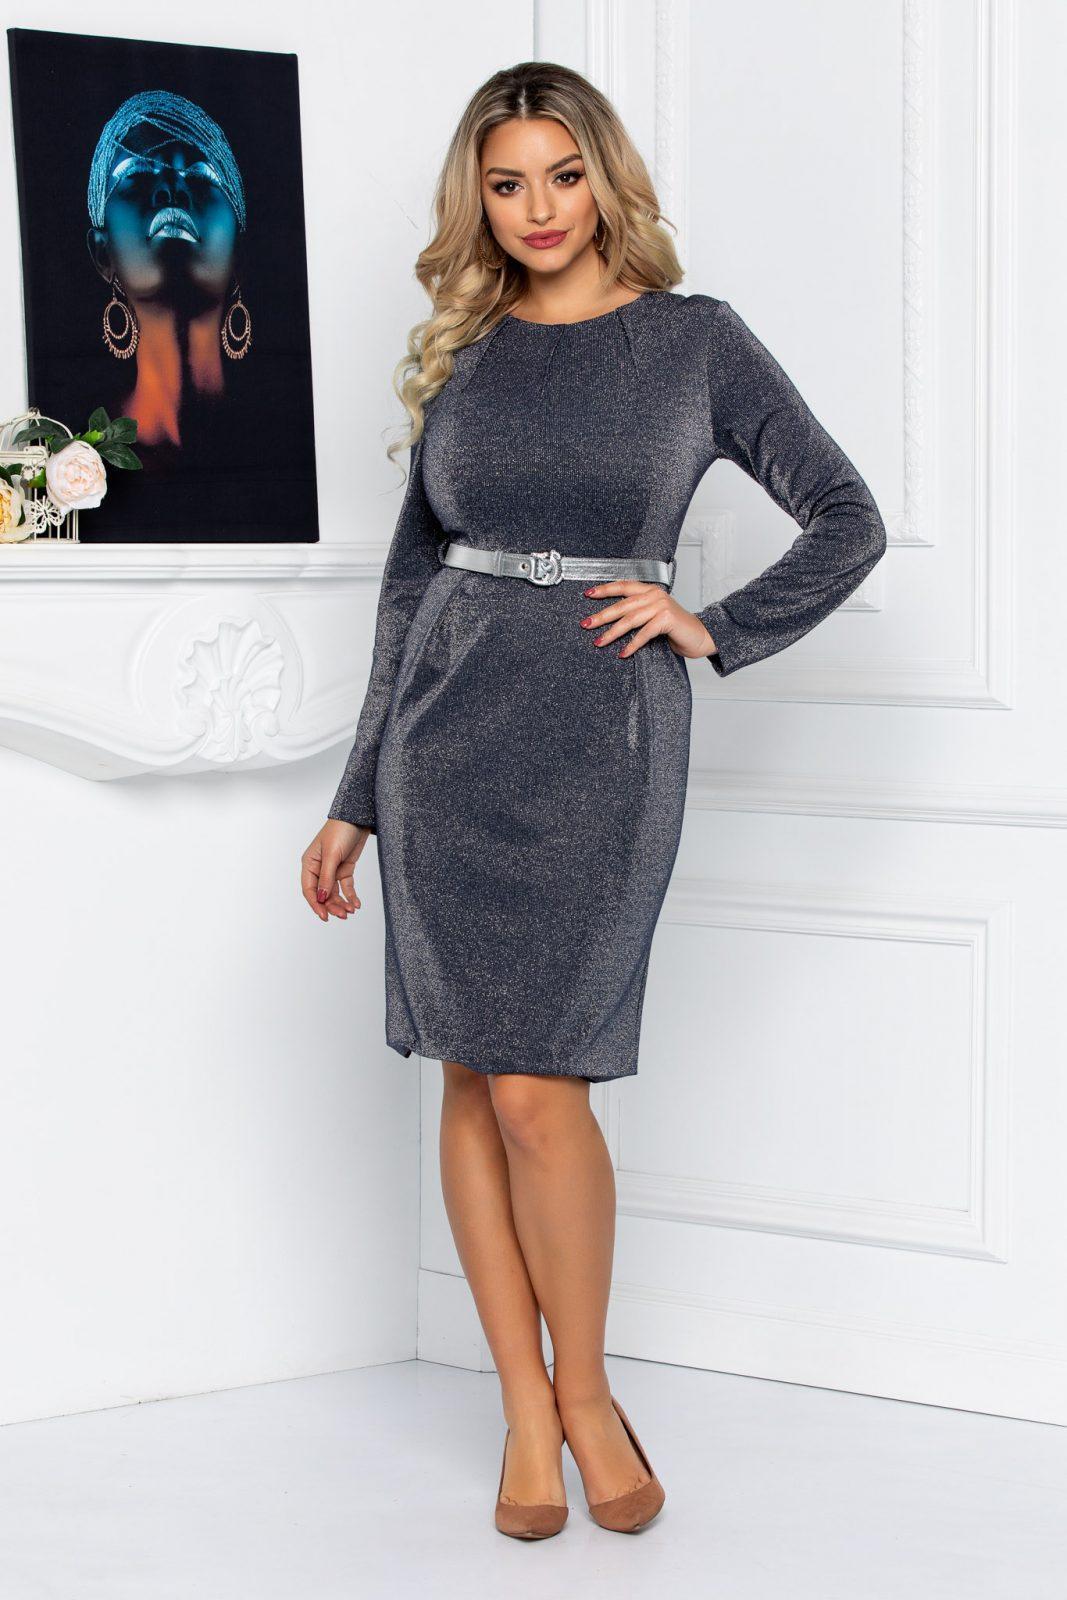 Camy Gray Dress